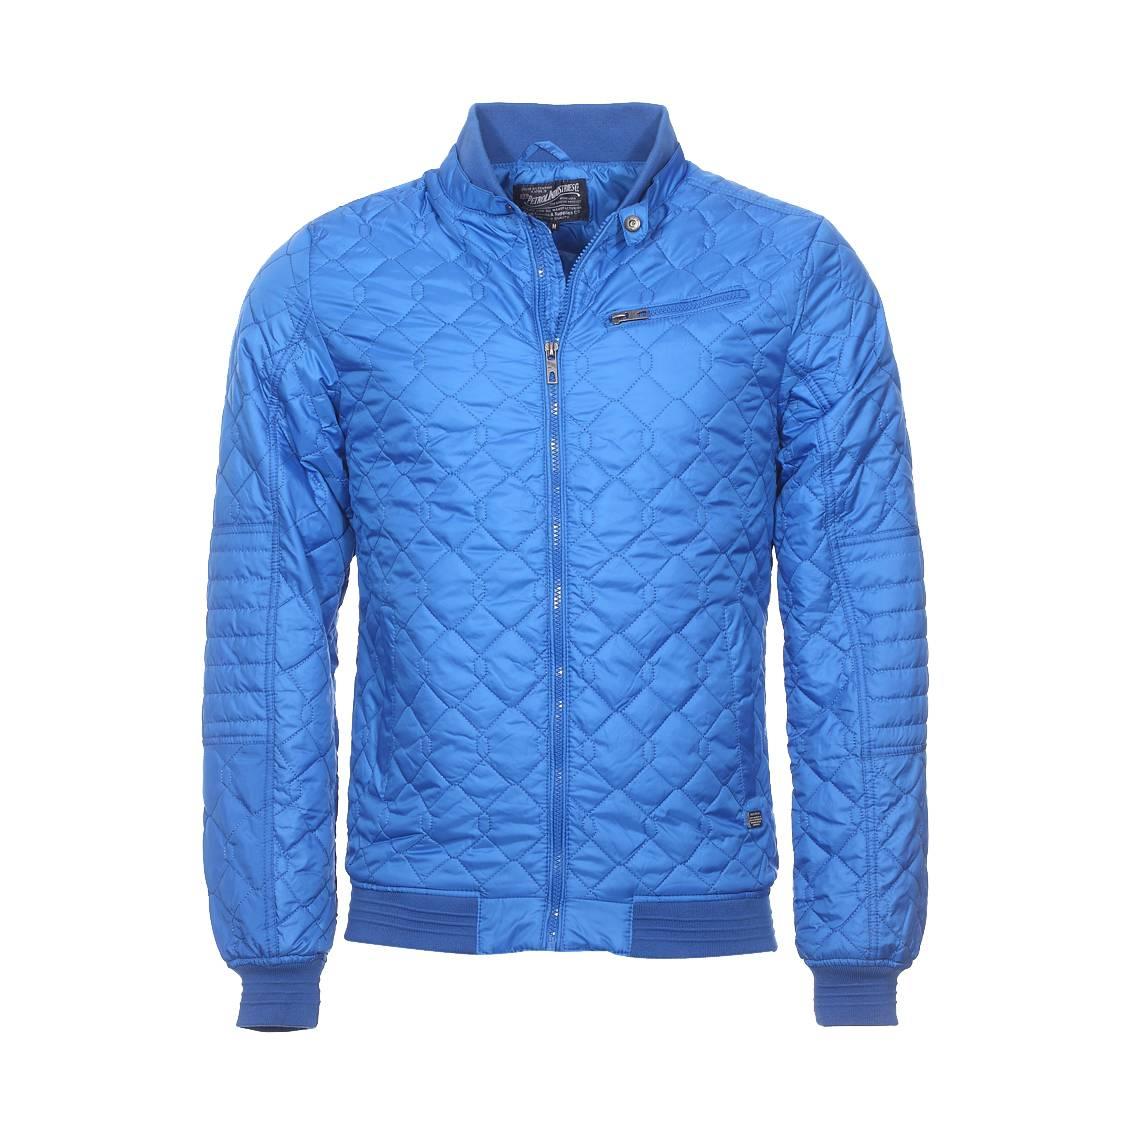 Blouson matelassé zippé  bleu roi